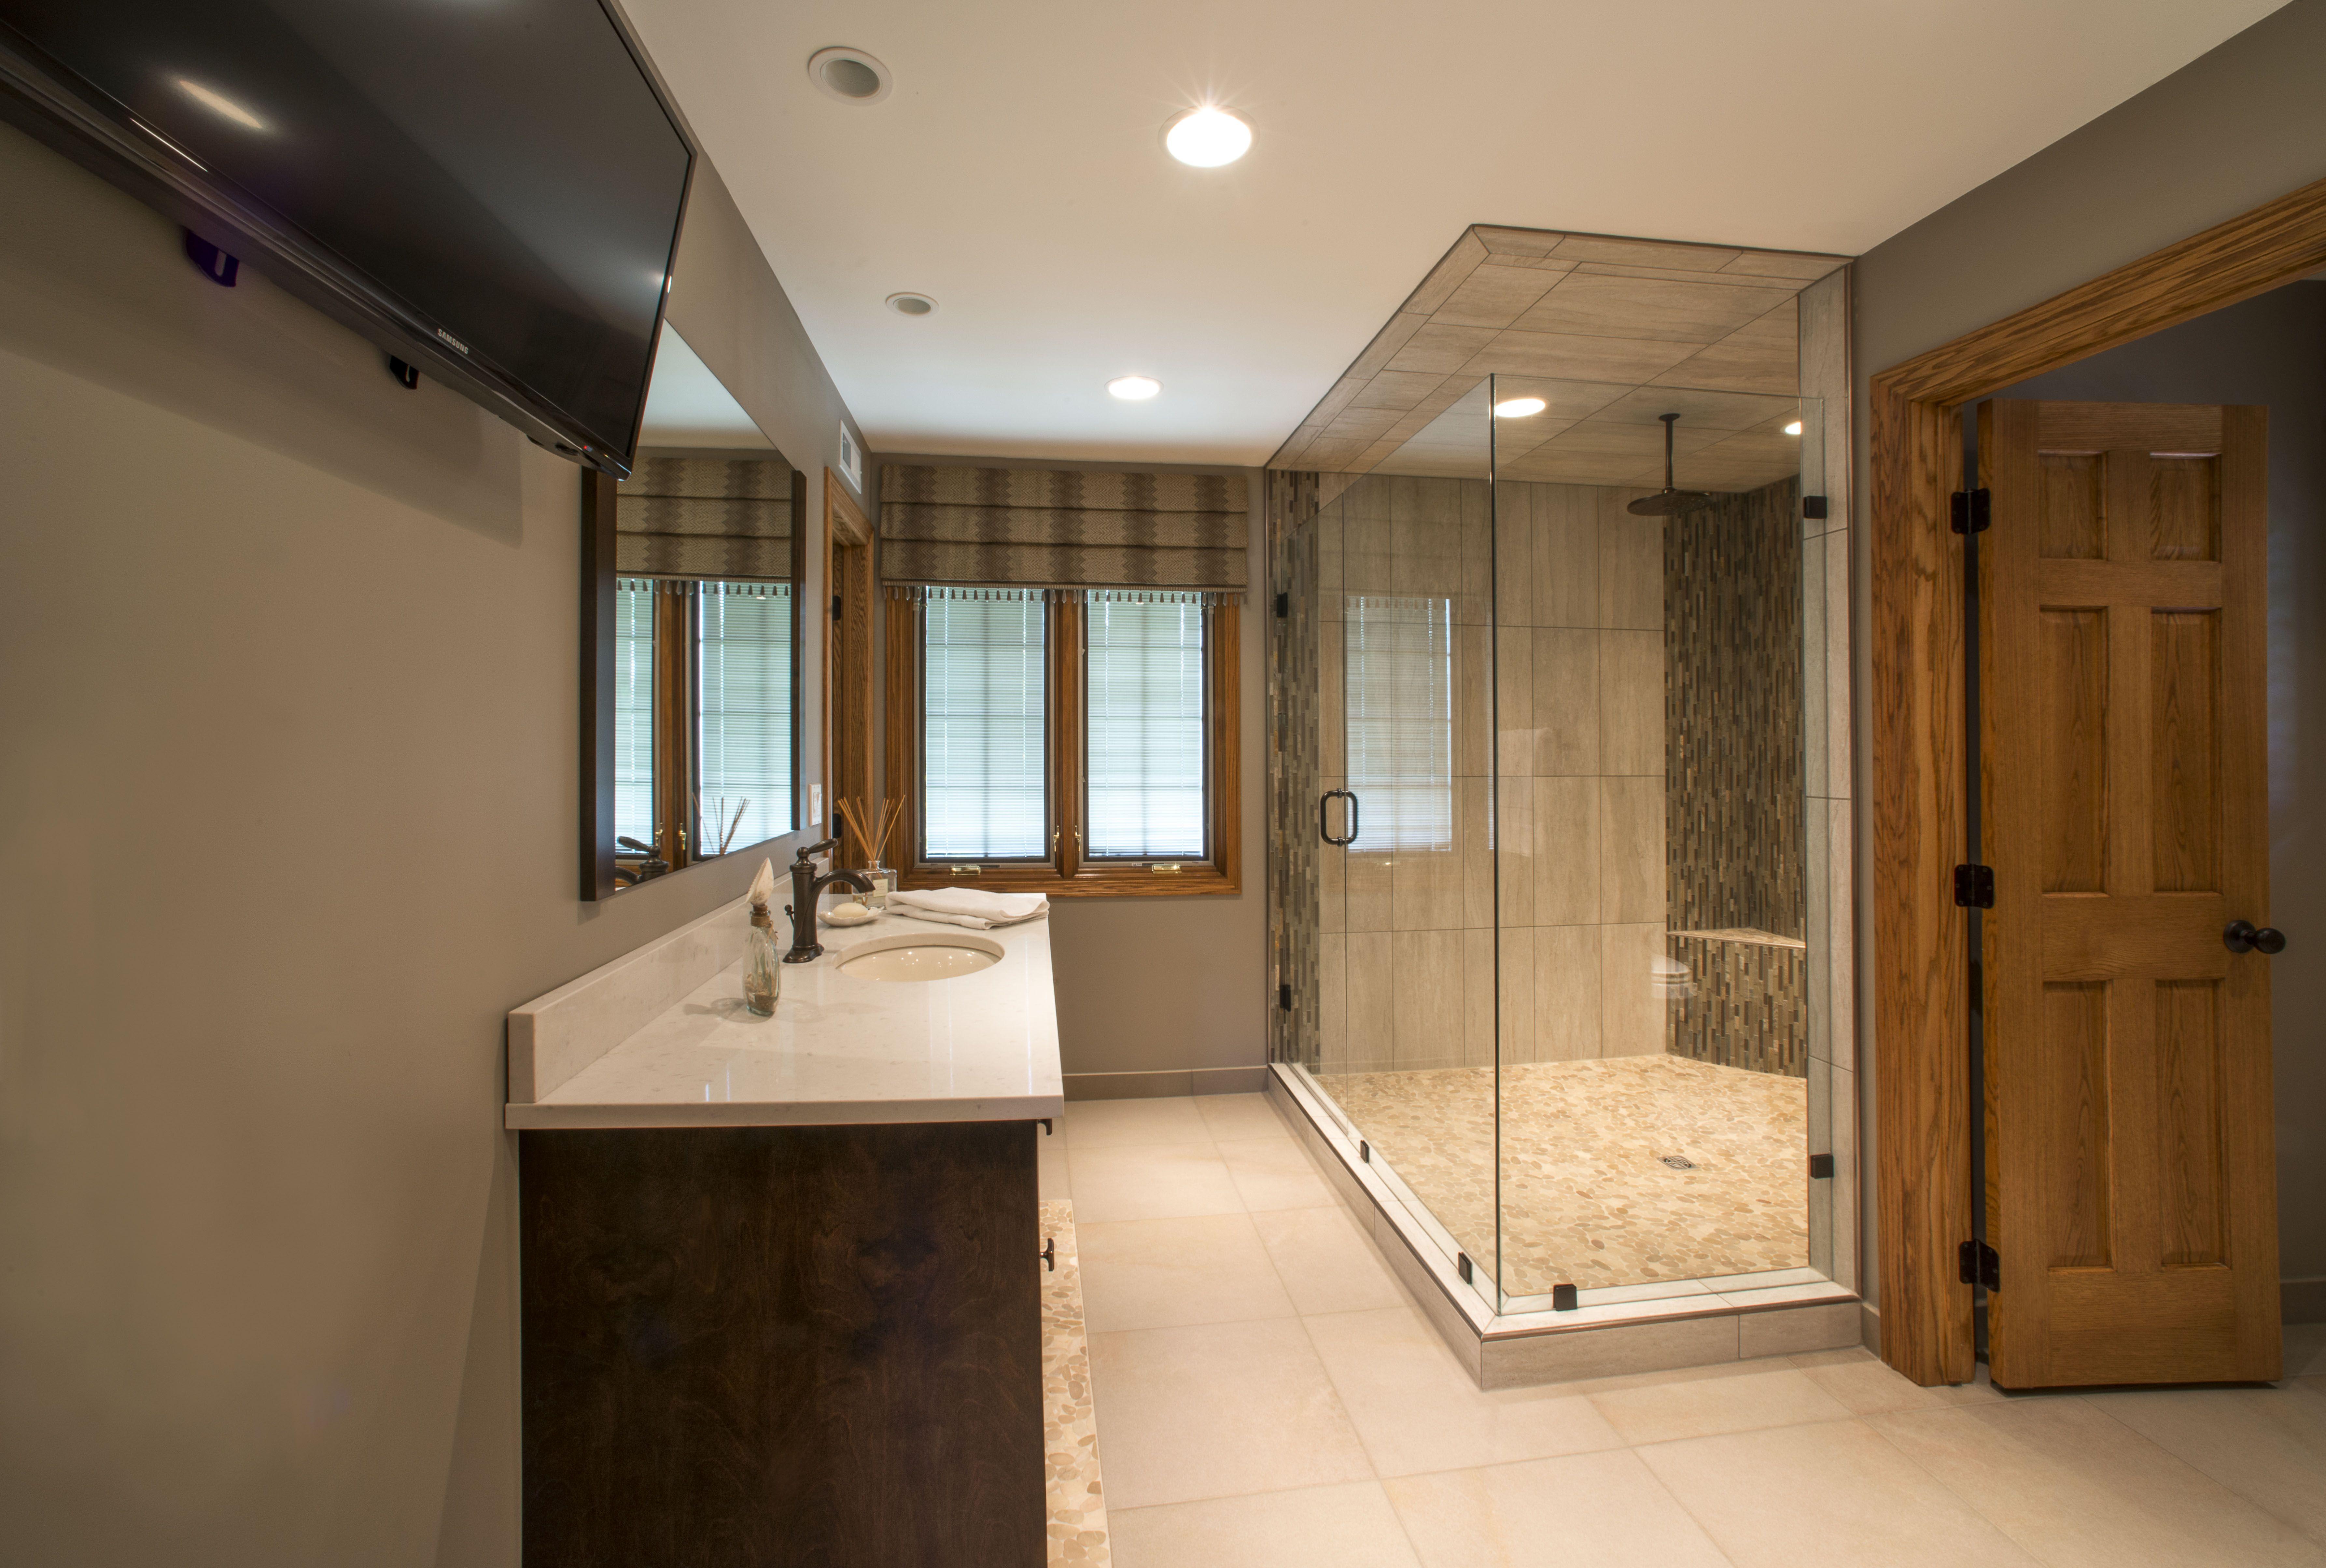 Master bedroom vs owners suite  Bathroom After Done by Designer and CoOwner Vicki Pierce ASID